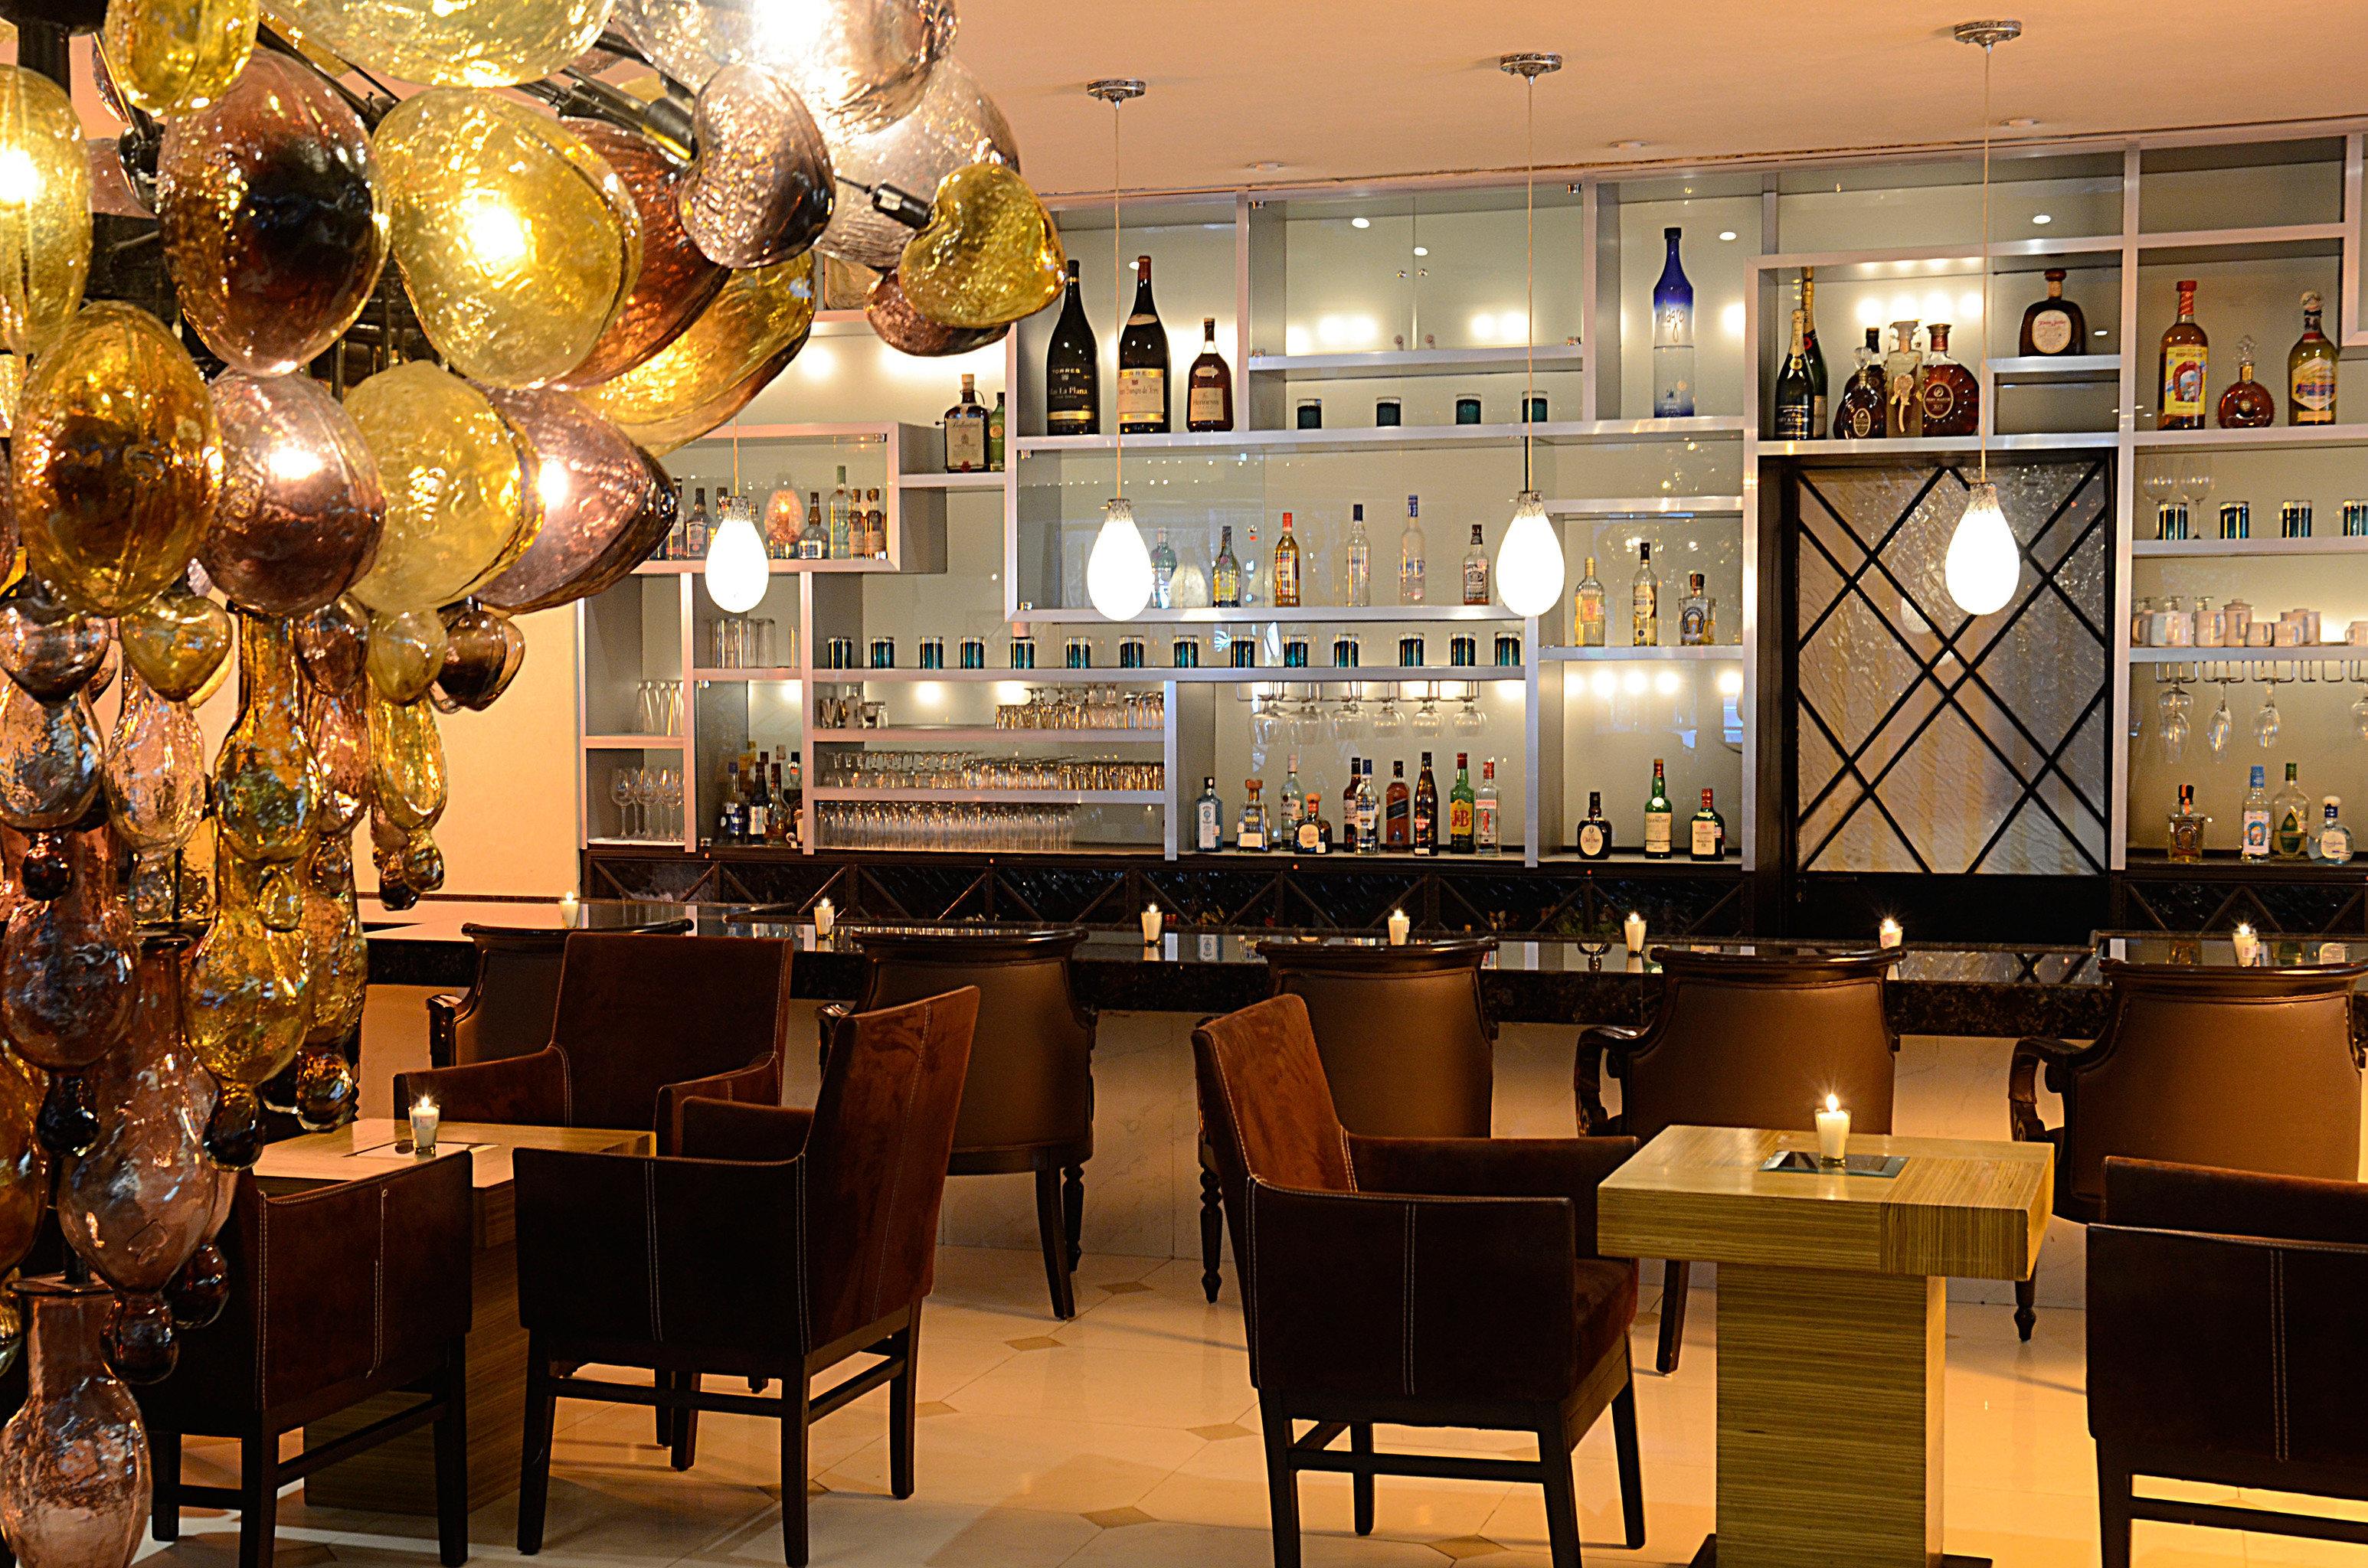 Dining Drink Eat Lounge Modern restaurant lighting café Bar